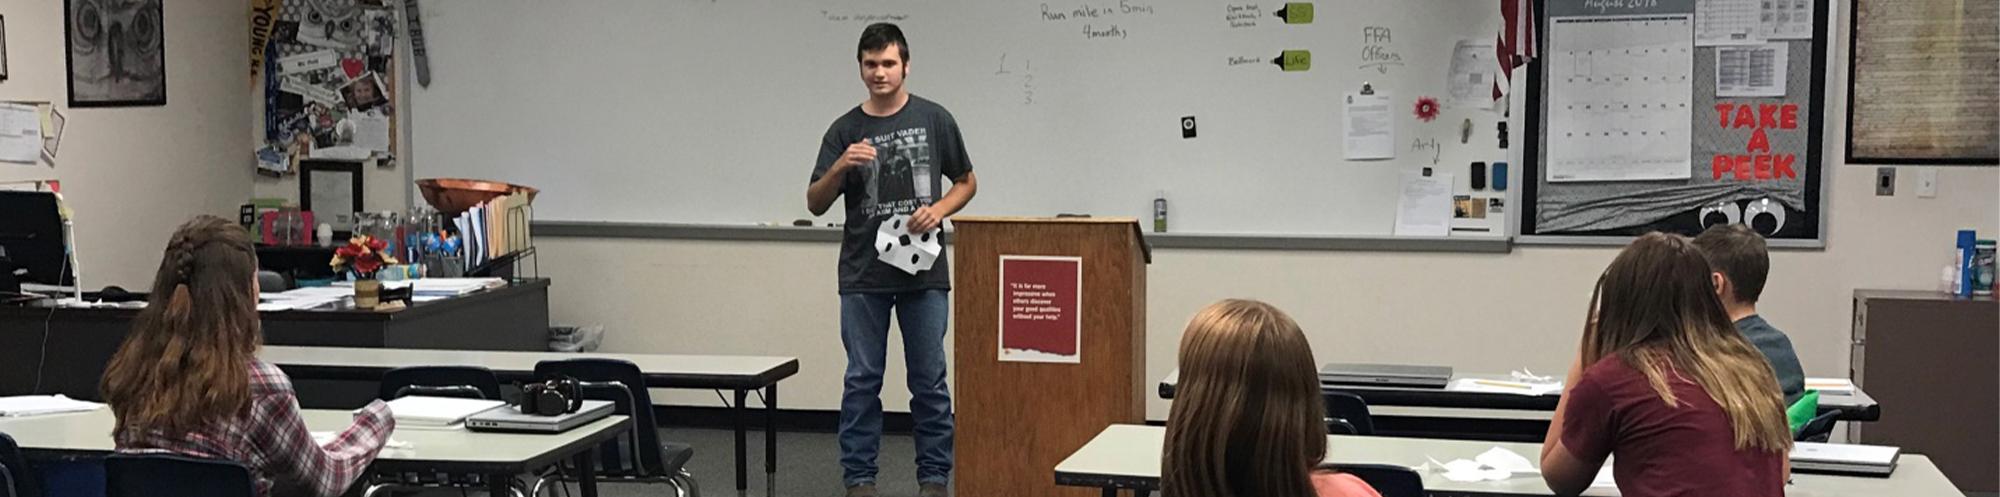 Student giving class presentation